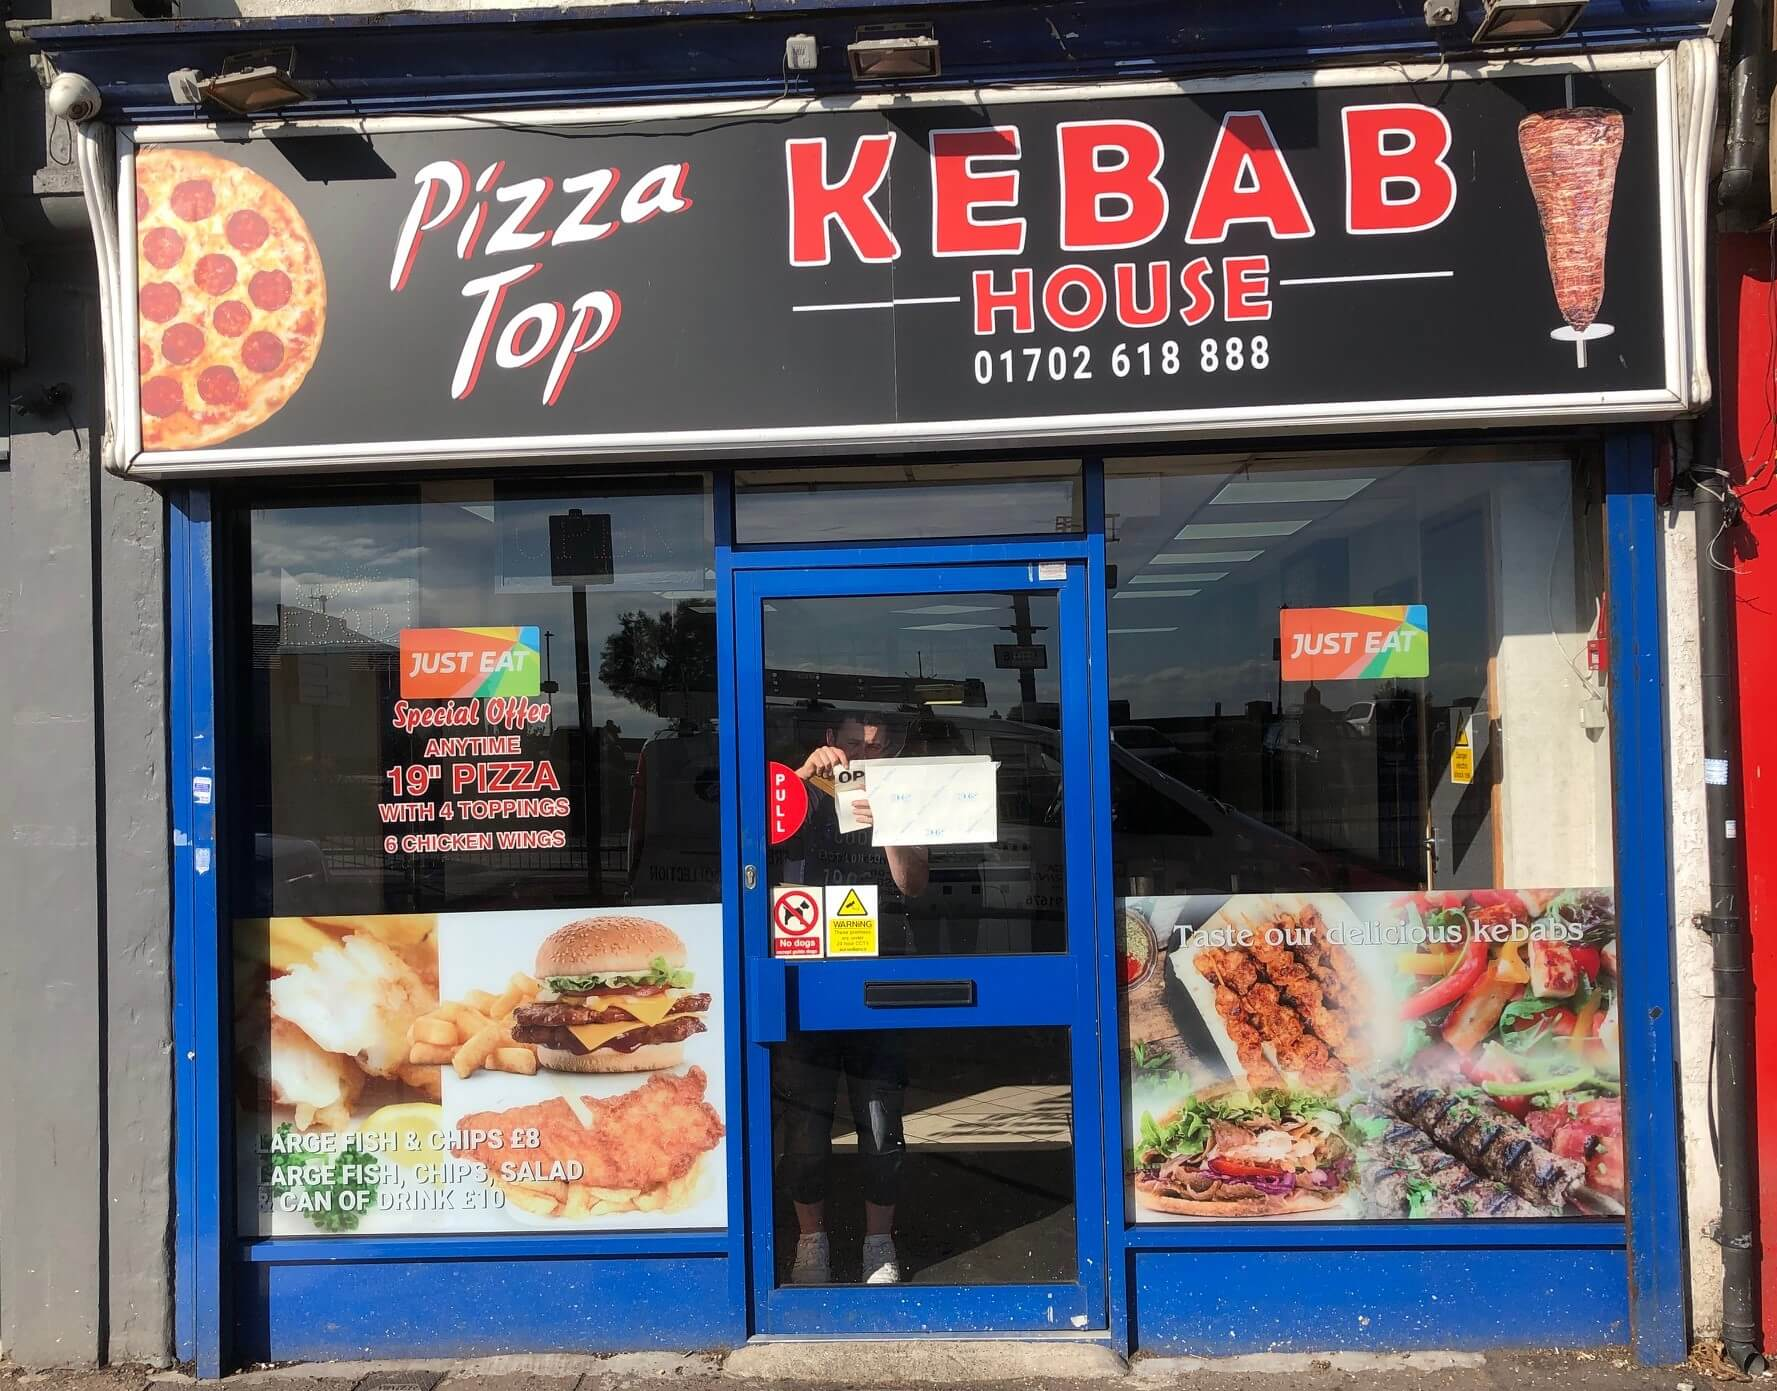 Kebab House sign + window